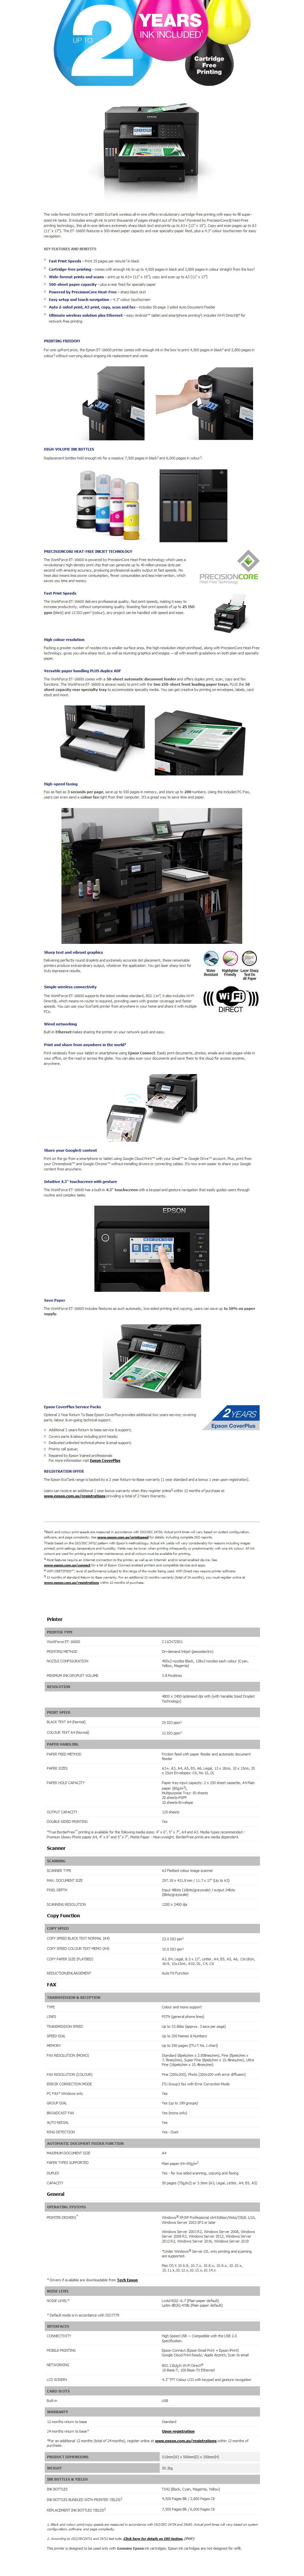 Epson WorkForce EcoTank ET-16600 A4 Colour MultiFunction Inkjet Printer - Overview 1